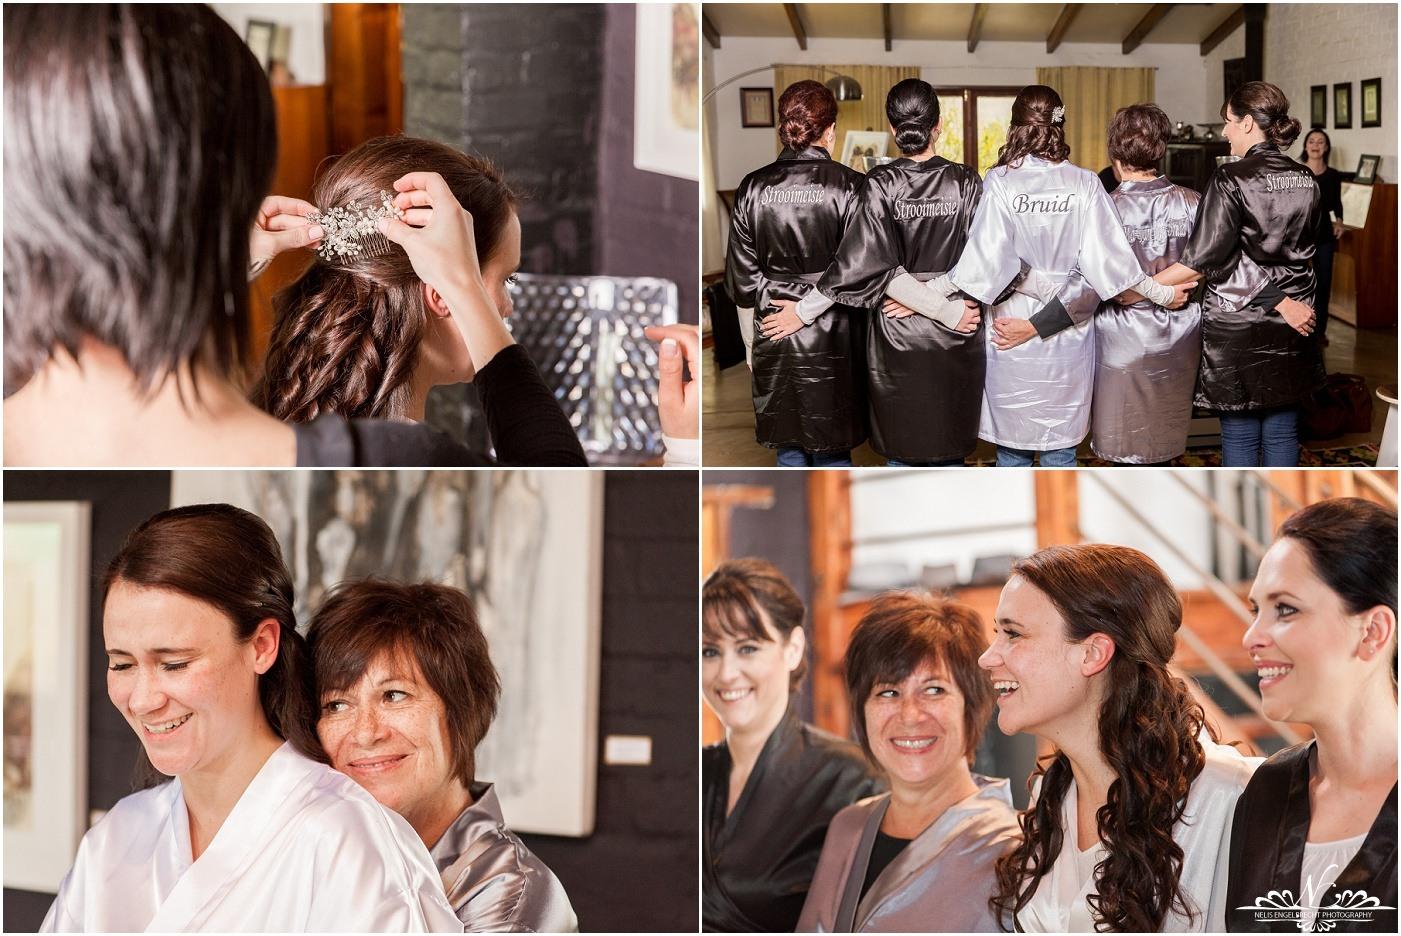 Eensgezind-Wedding-Photos-Nelis-Engelbrecht-Photography-023